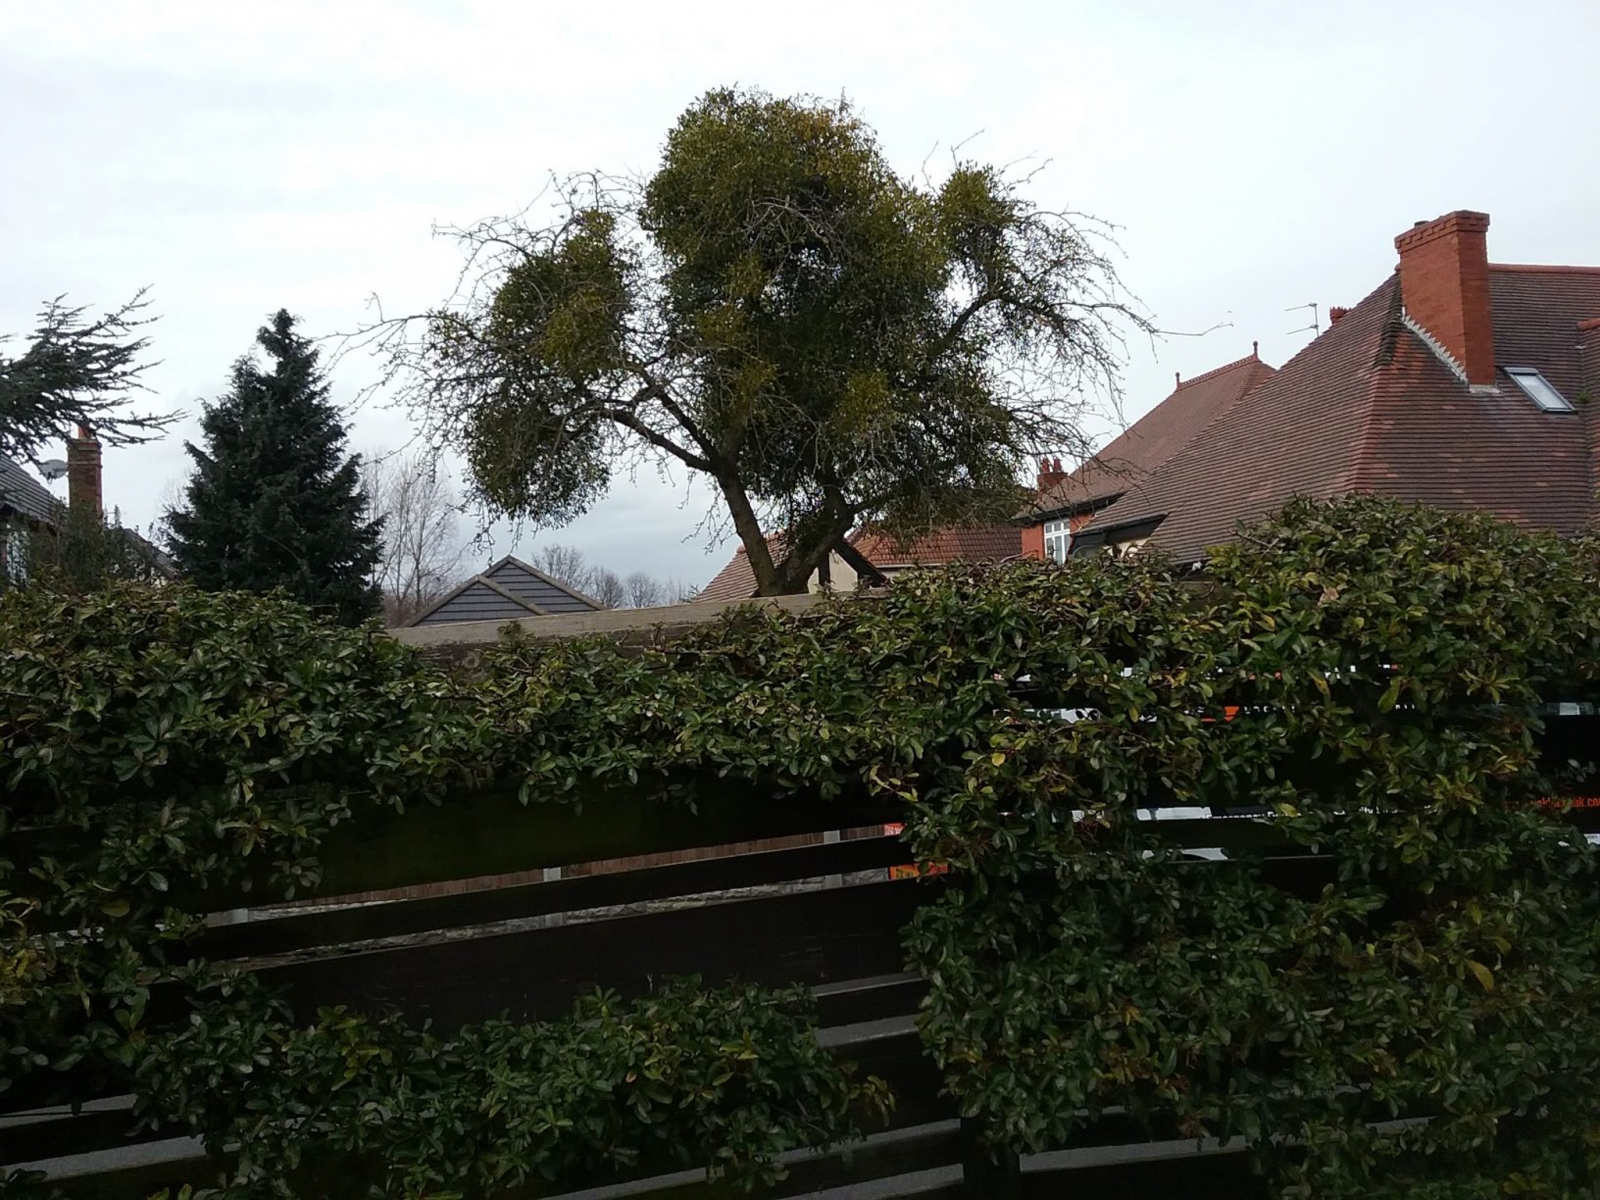 Mistletoe-Viscum-album-near-Bawtry-Road-Doncaster